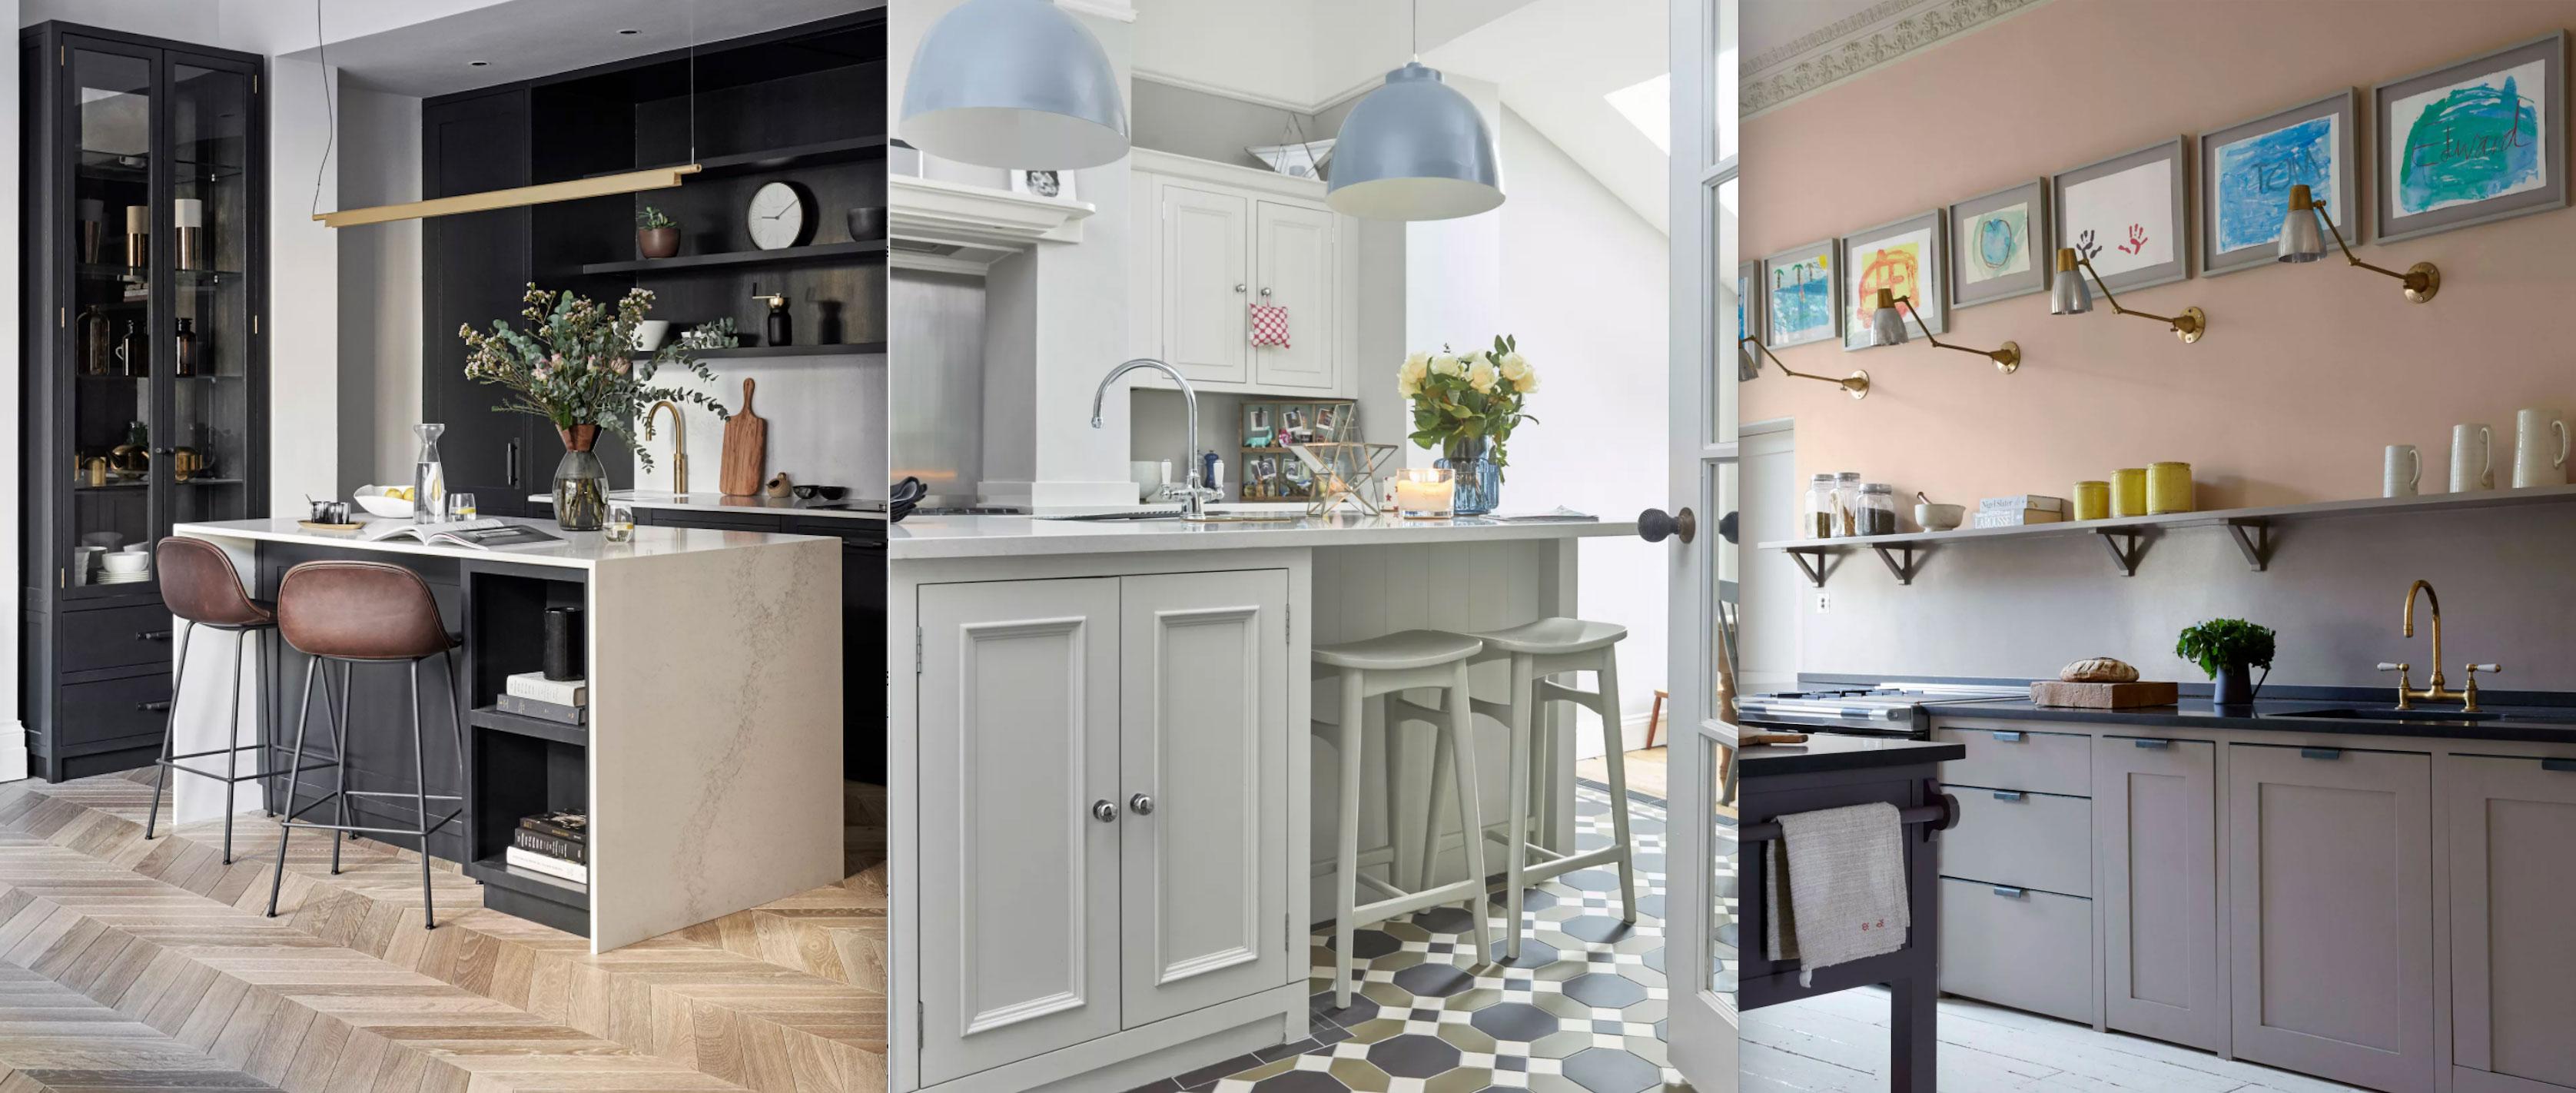 24 Small Kitchen Ideas Design And Decor Homes Gardens